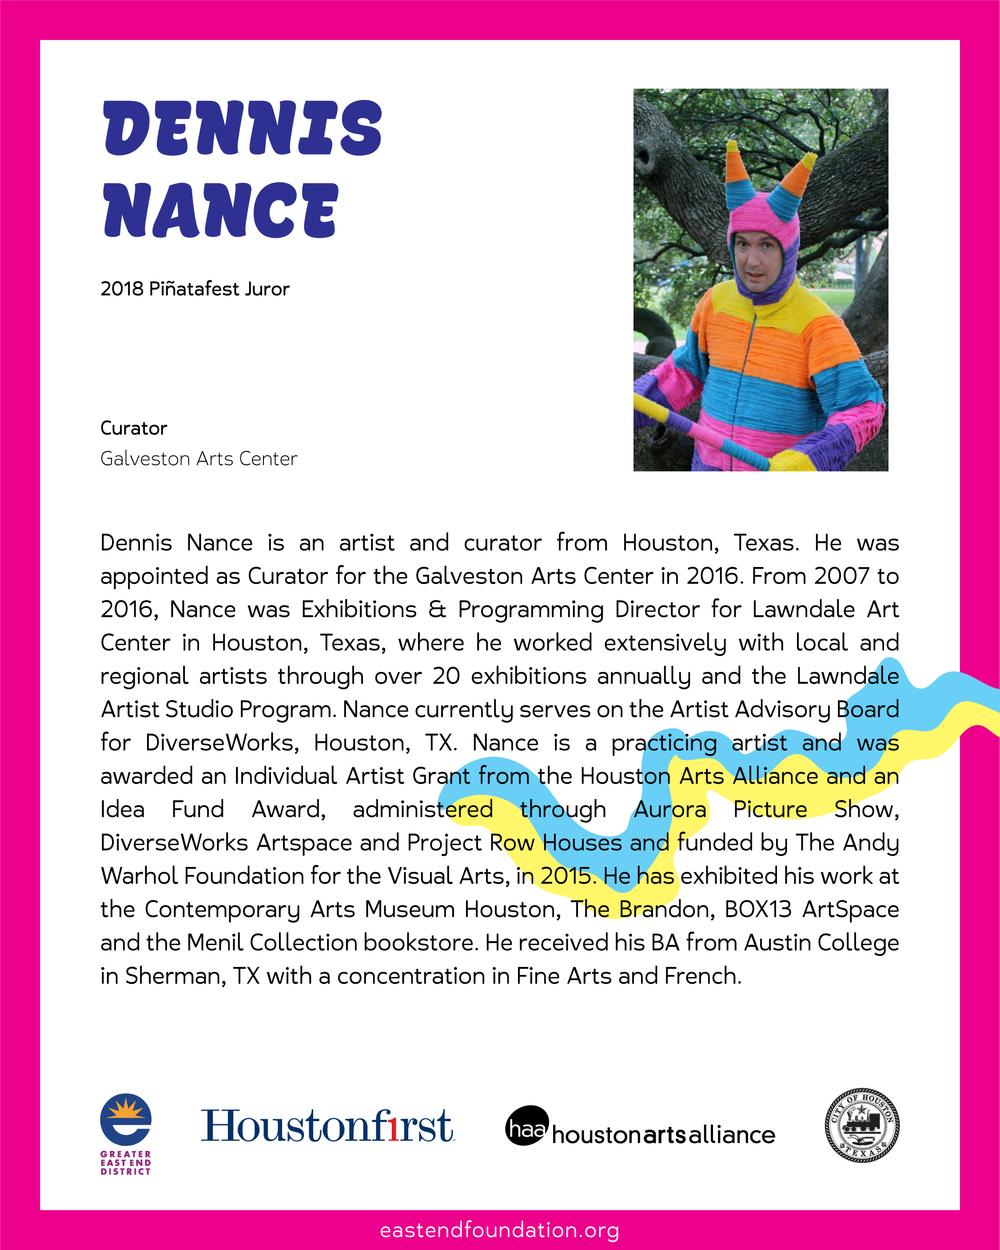 Pinatafest_2018_East_End_Foundation_Houston_Dennis_Nance.png